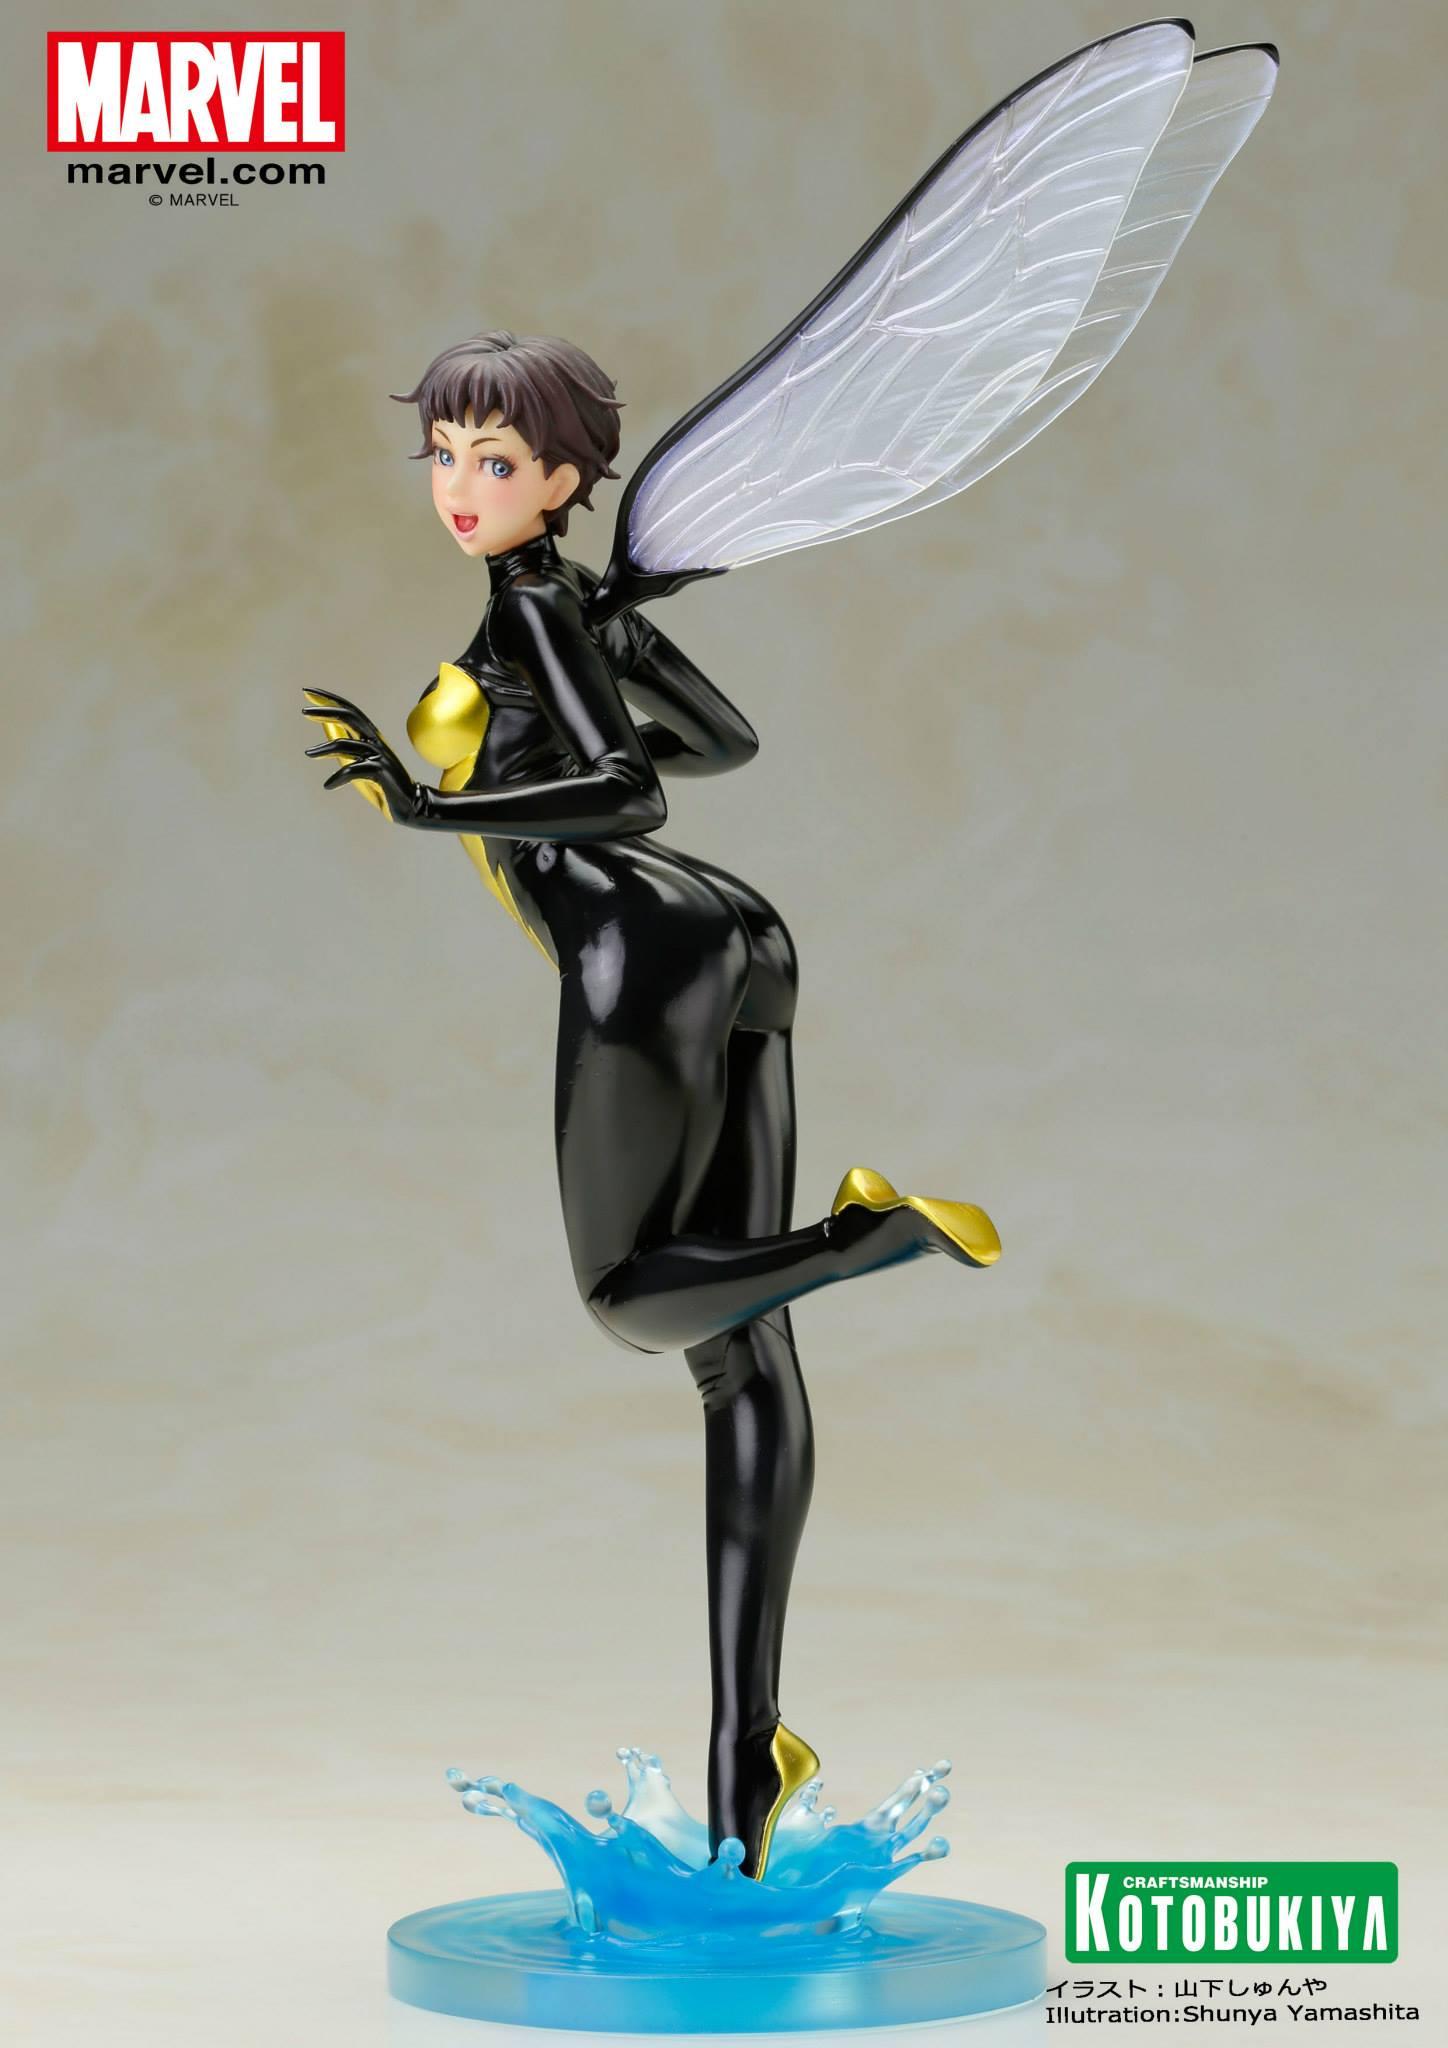 wasp-marvel-bishoujo-statue-kotobukiya-1